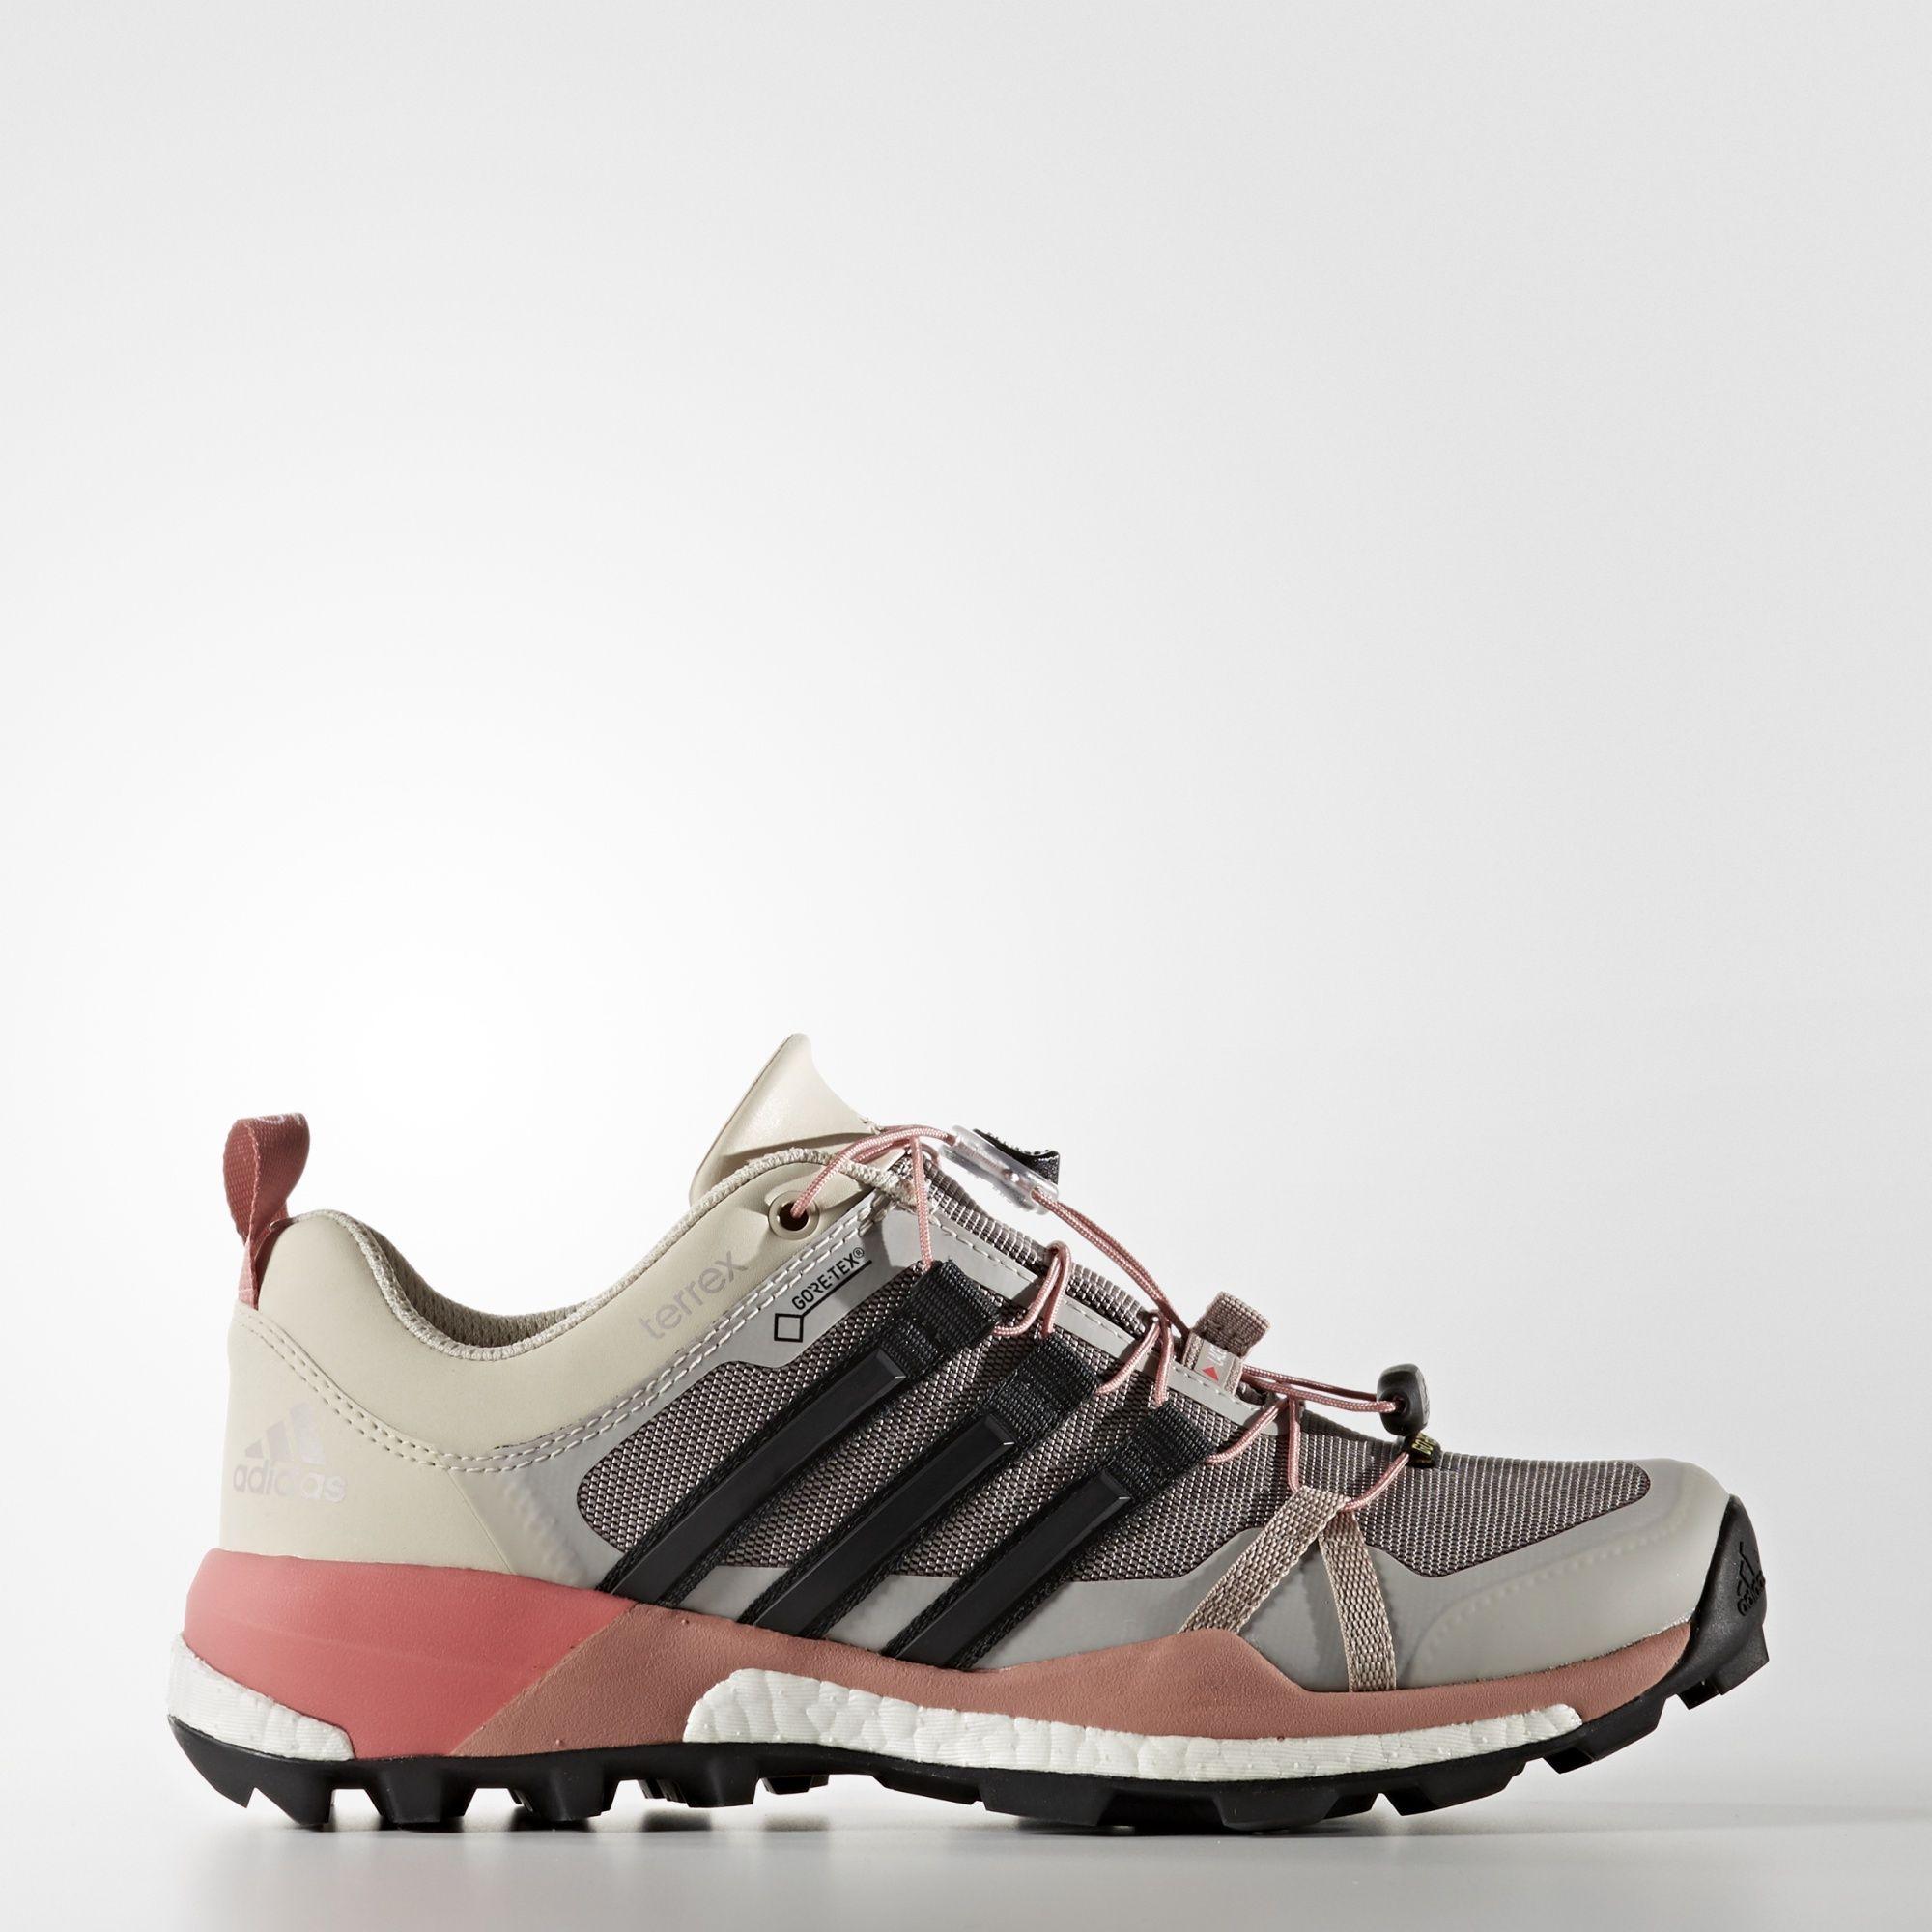 e090fb54b adidas - Terrex Boost GTX Shoes | Julianne's Wish List | Adidas ...